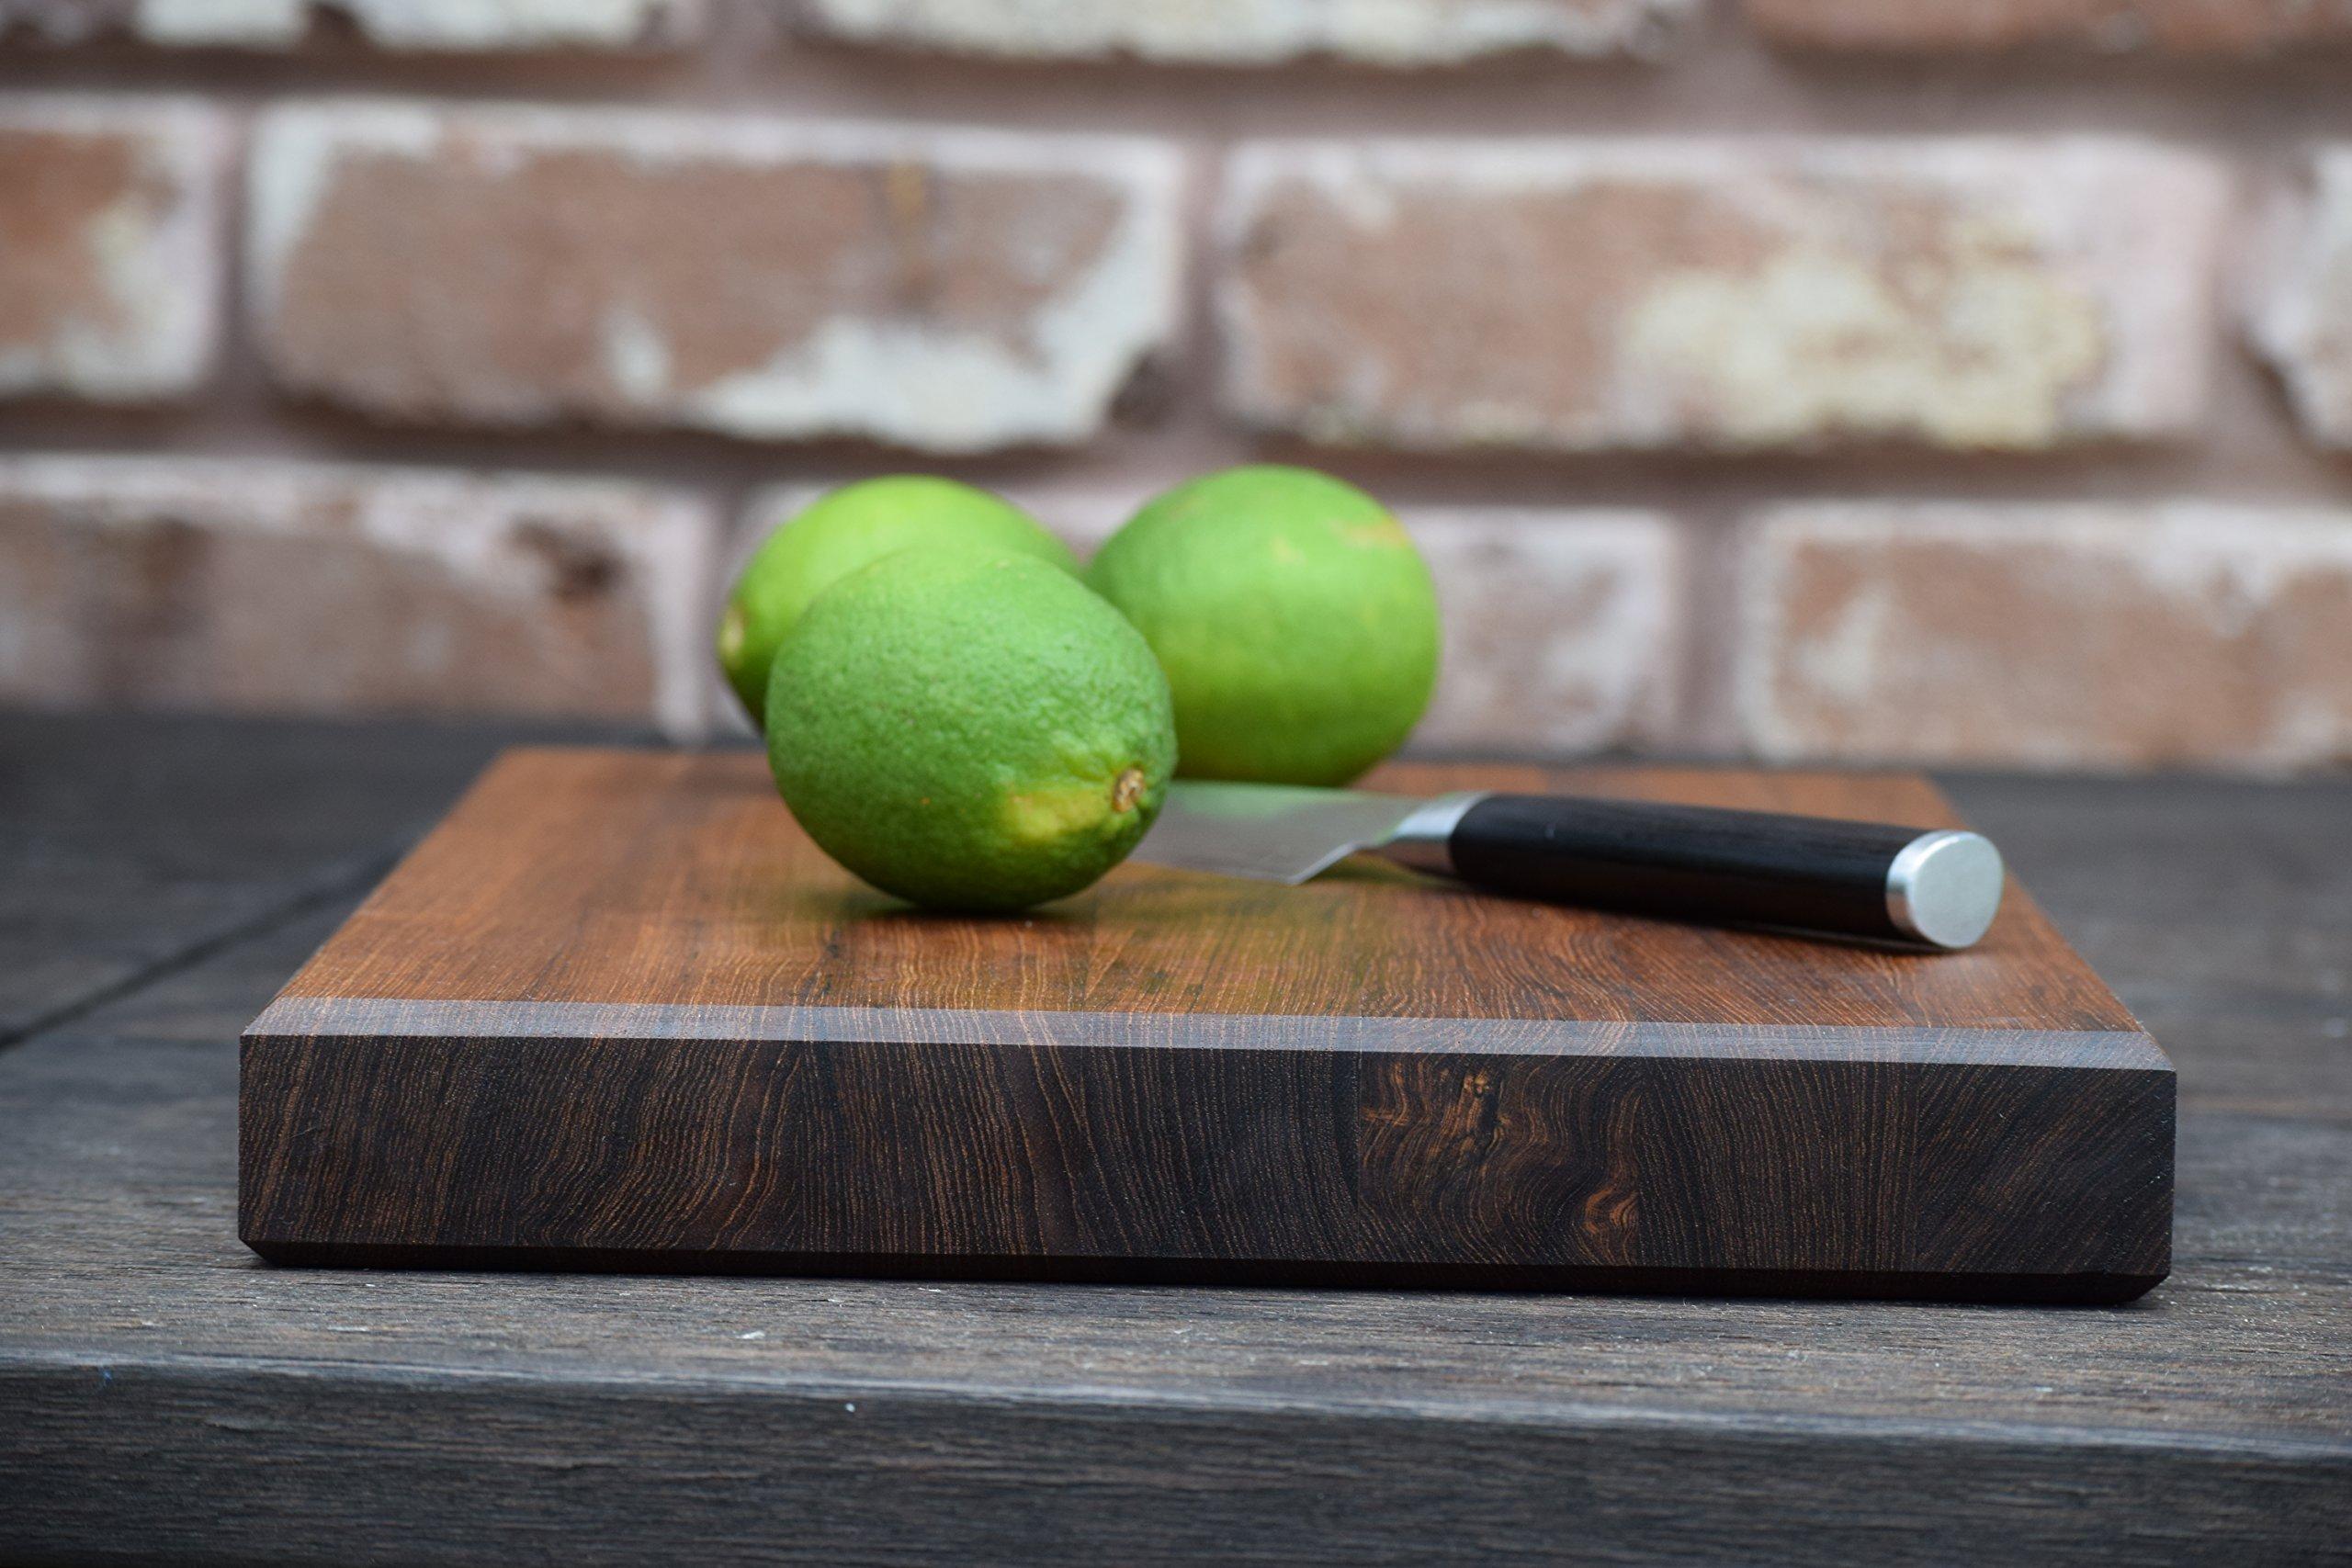 Teak Wood Edge Grain Cutting Board Handmade Reversible Butcher Block by The Practical Plankist (Image #7)